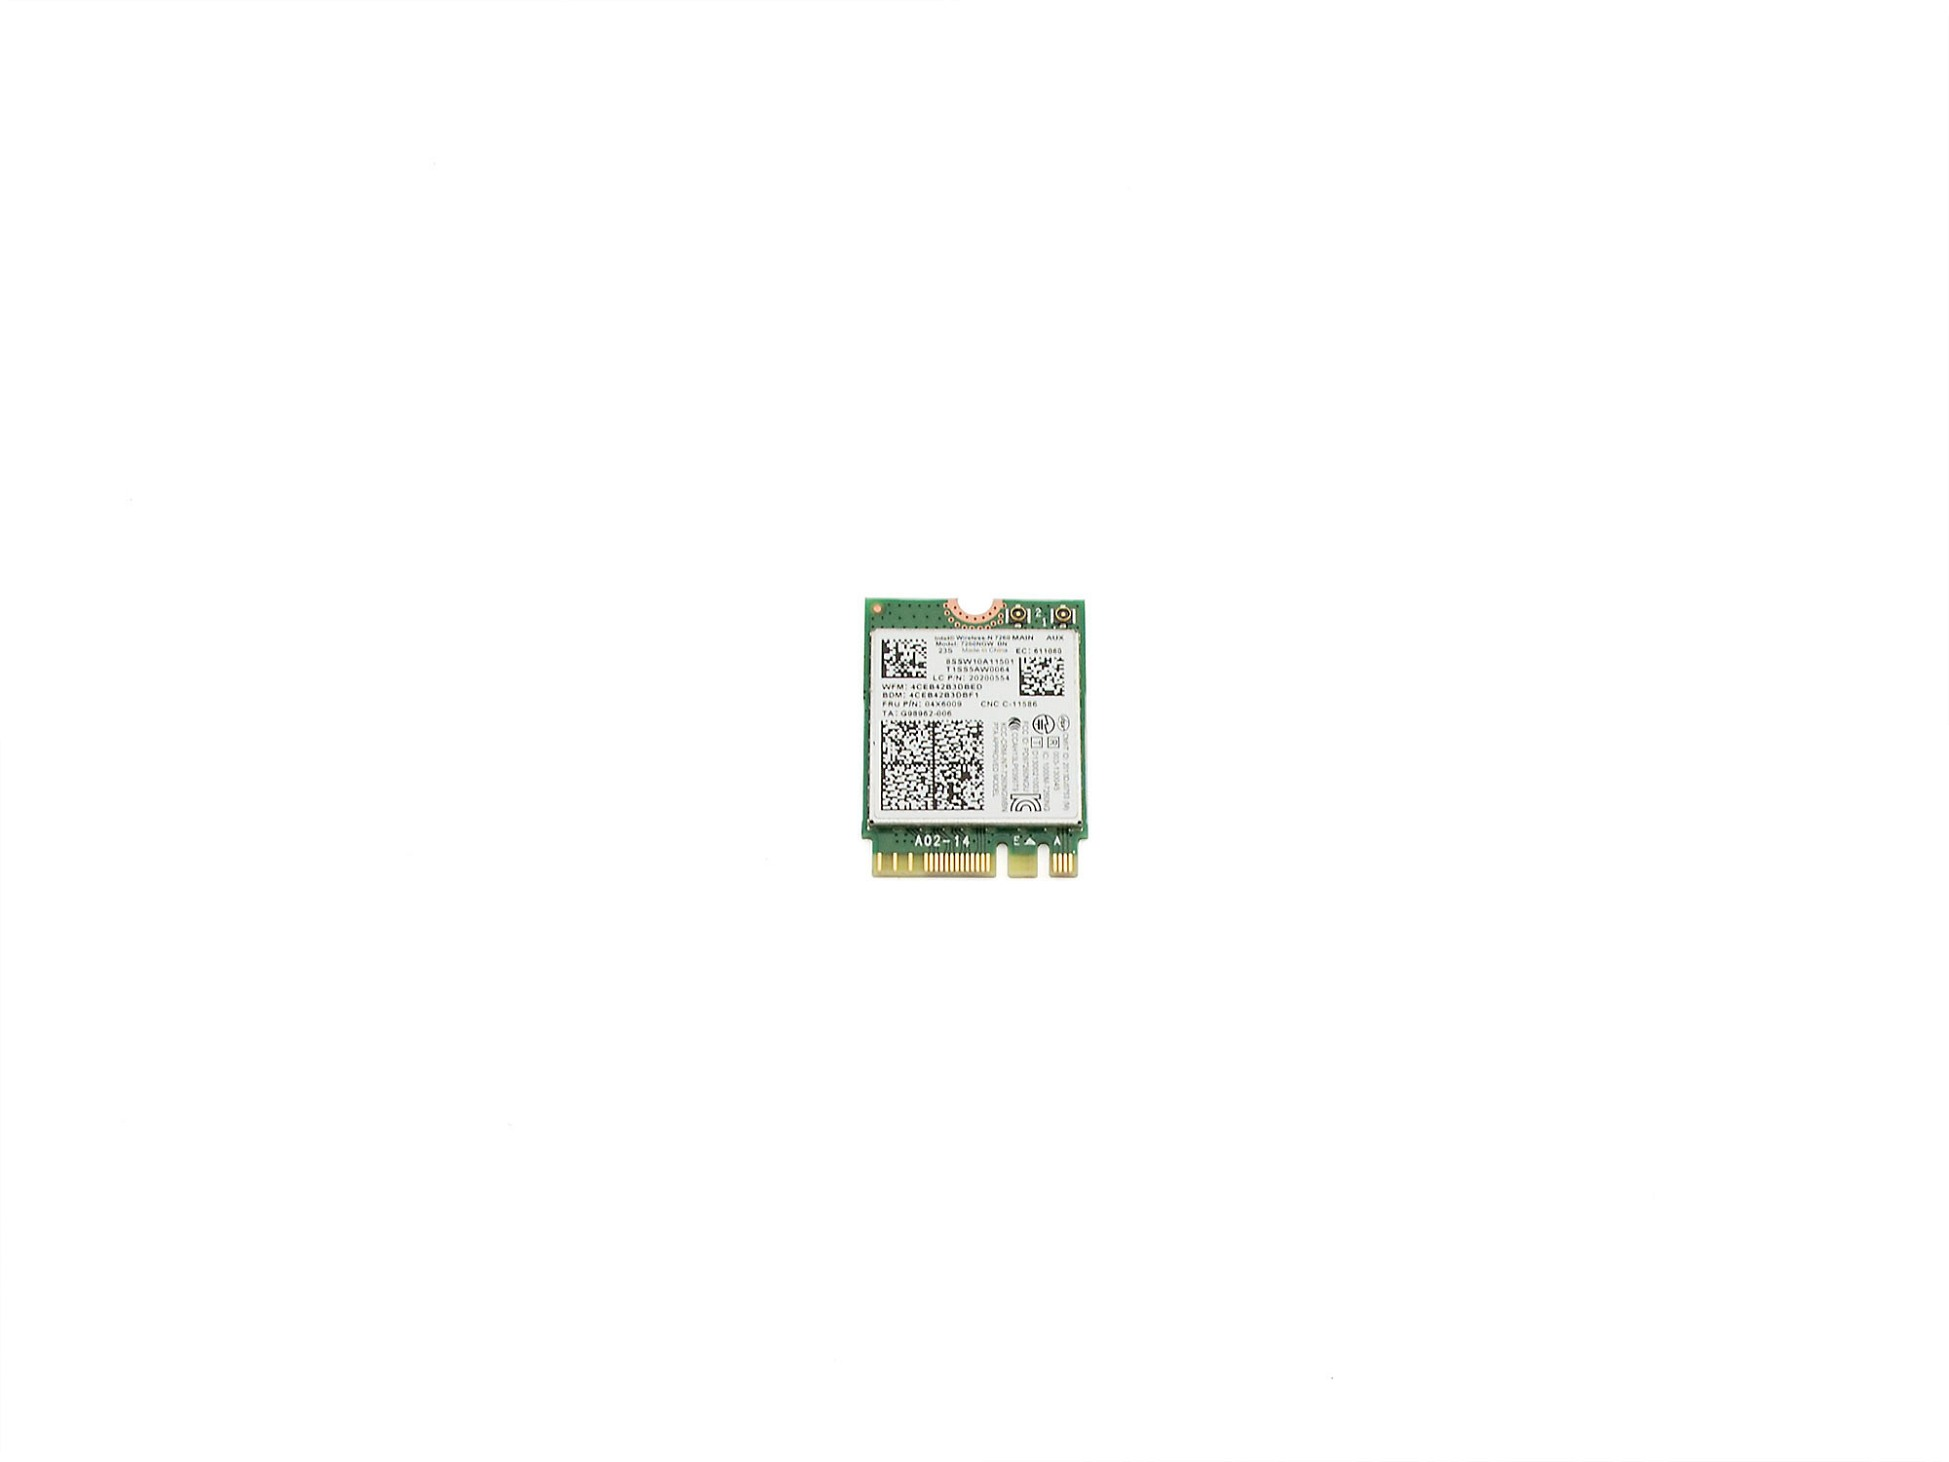 Intel Wireless-N 7260 MAIN für Lenovo ThinkPad L440 Serie